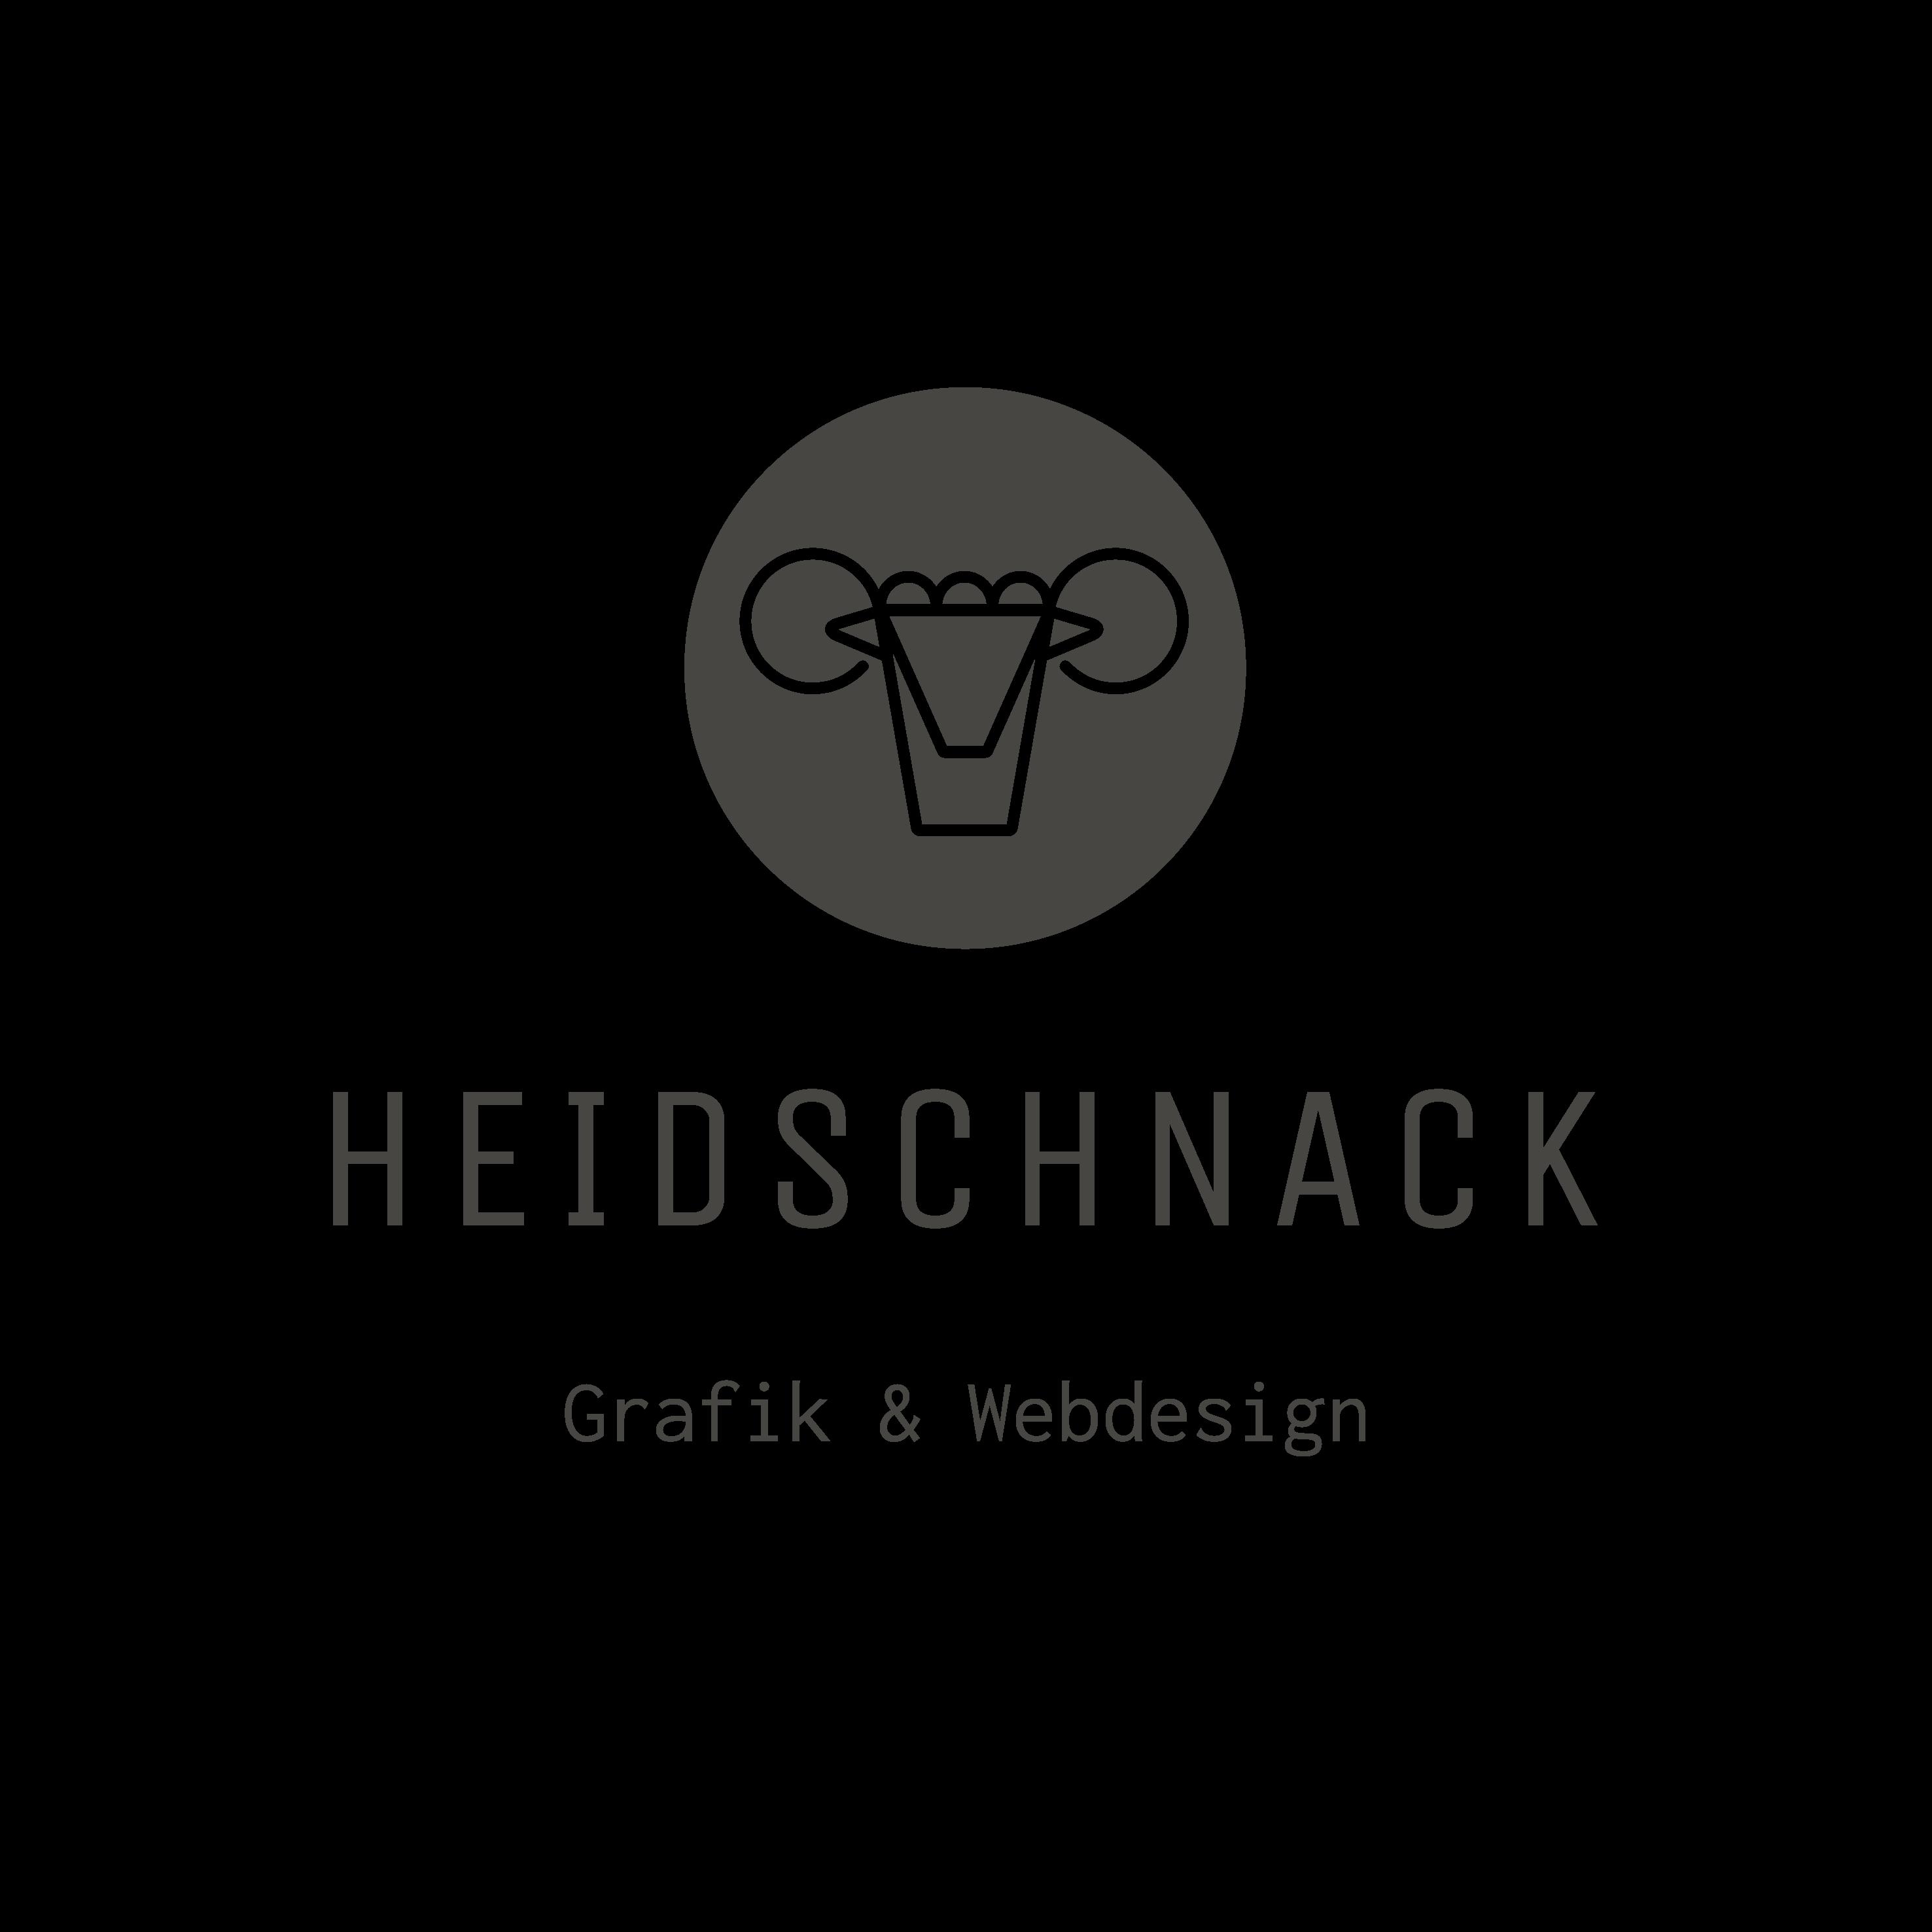 Freiraum Lüneburg UG (haftungsbeschränkt) (Heidschnack Grafik & Web Design)